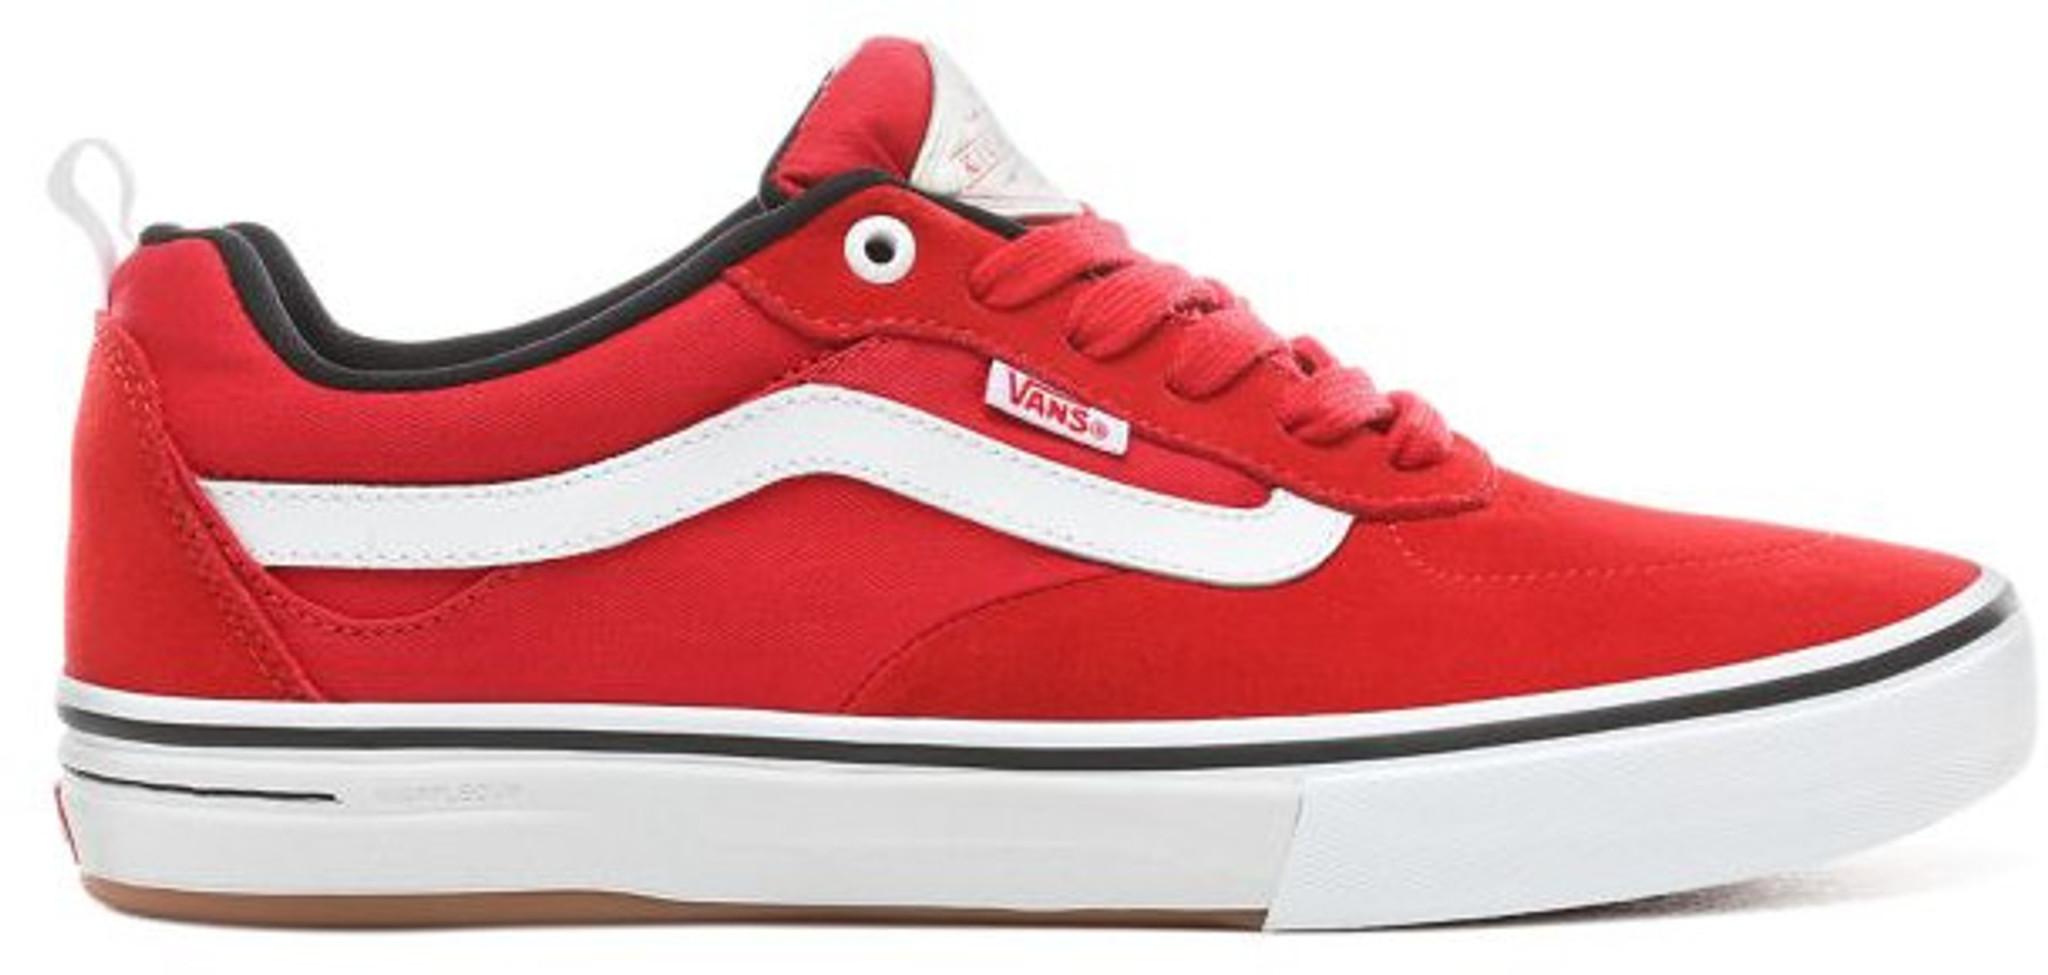 Vans - Kyle Walker Pro - Red/White